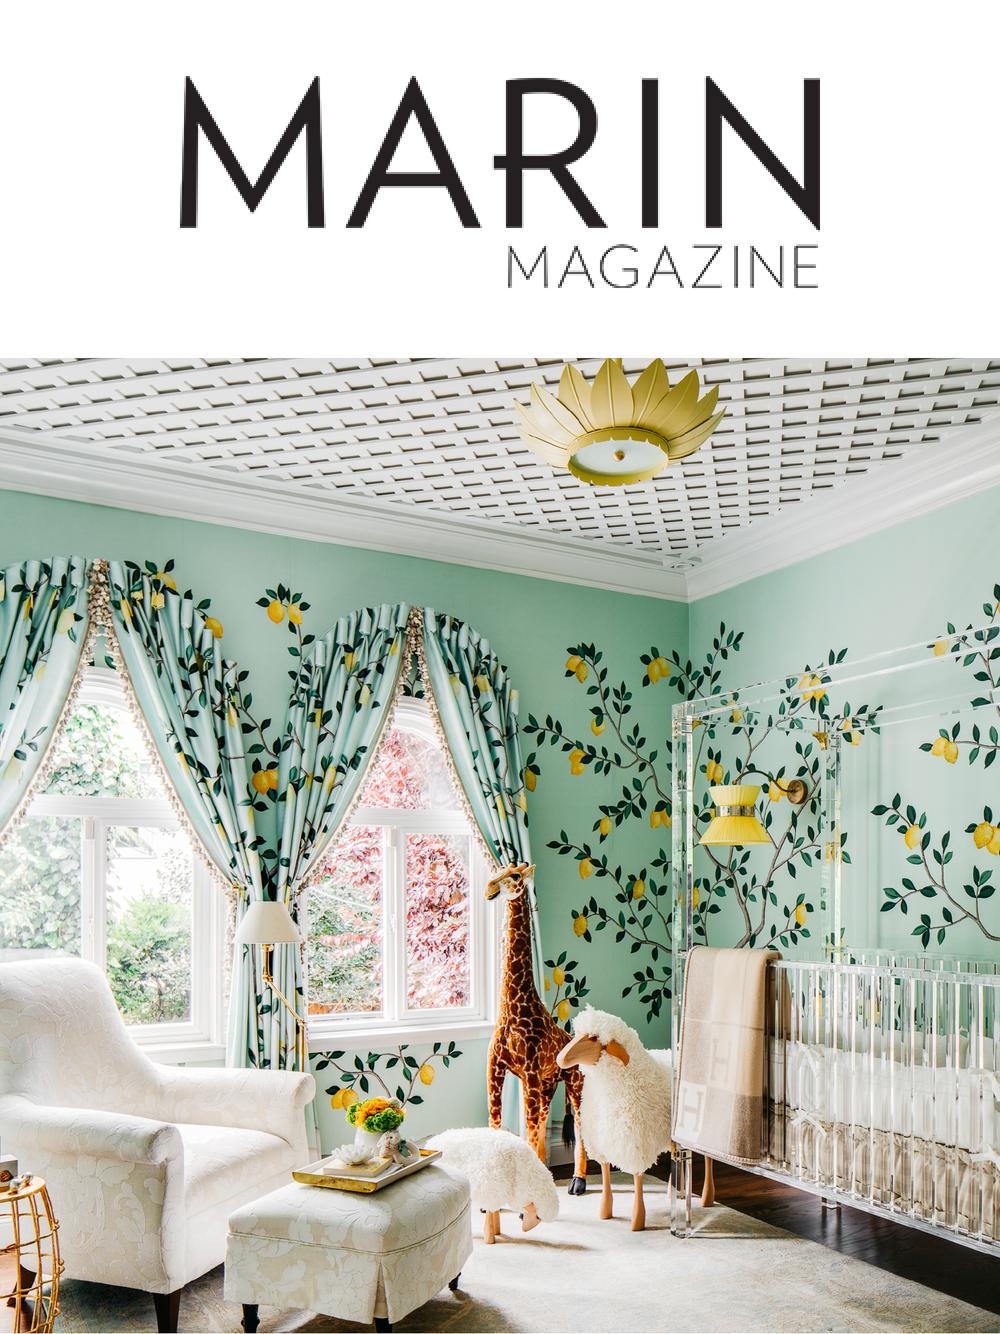 SFShowcase_PR_MarinMagazine.png